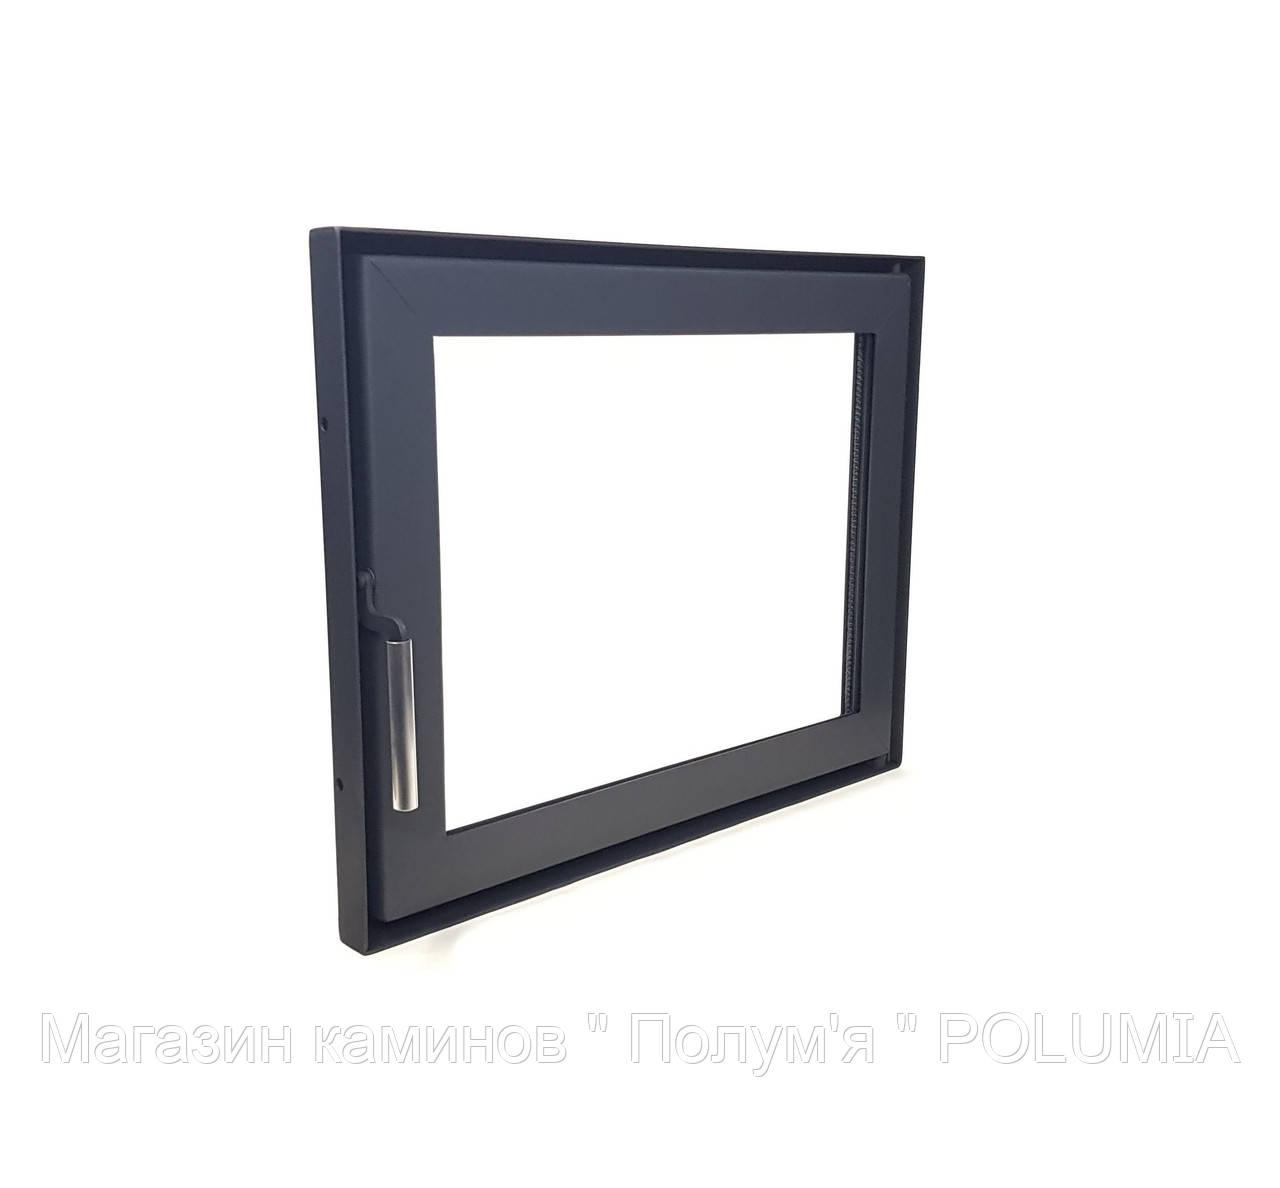 Дверца для камина Ognevoda 600х470 мм, стекло внутреннее, ручка Lite